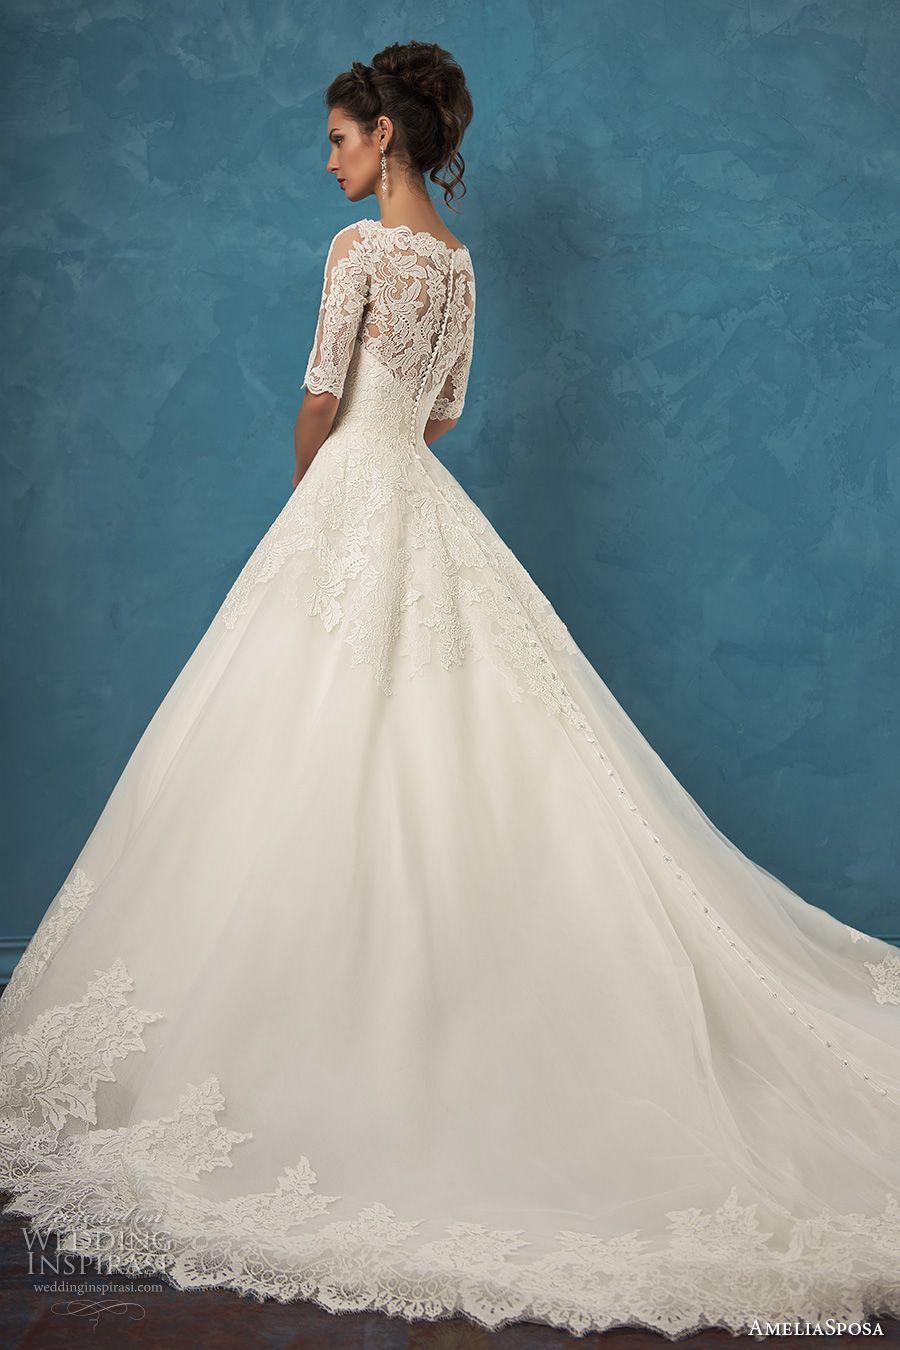 Amelia Sposa 2017 Wedding Dresses | Pinterest | Novios, De novia y ...